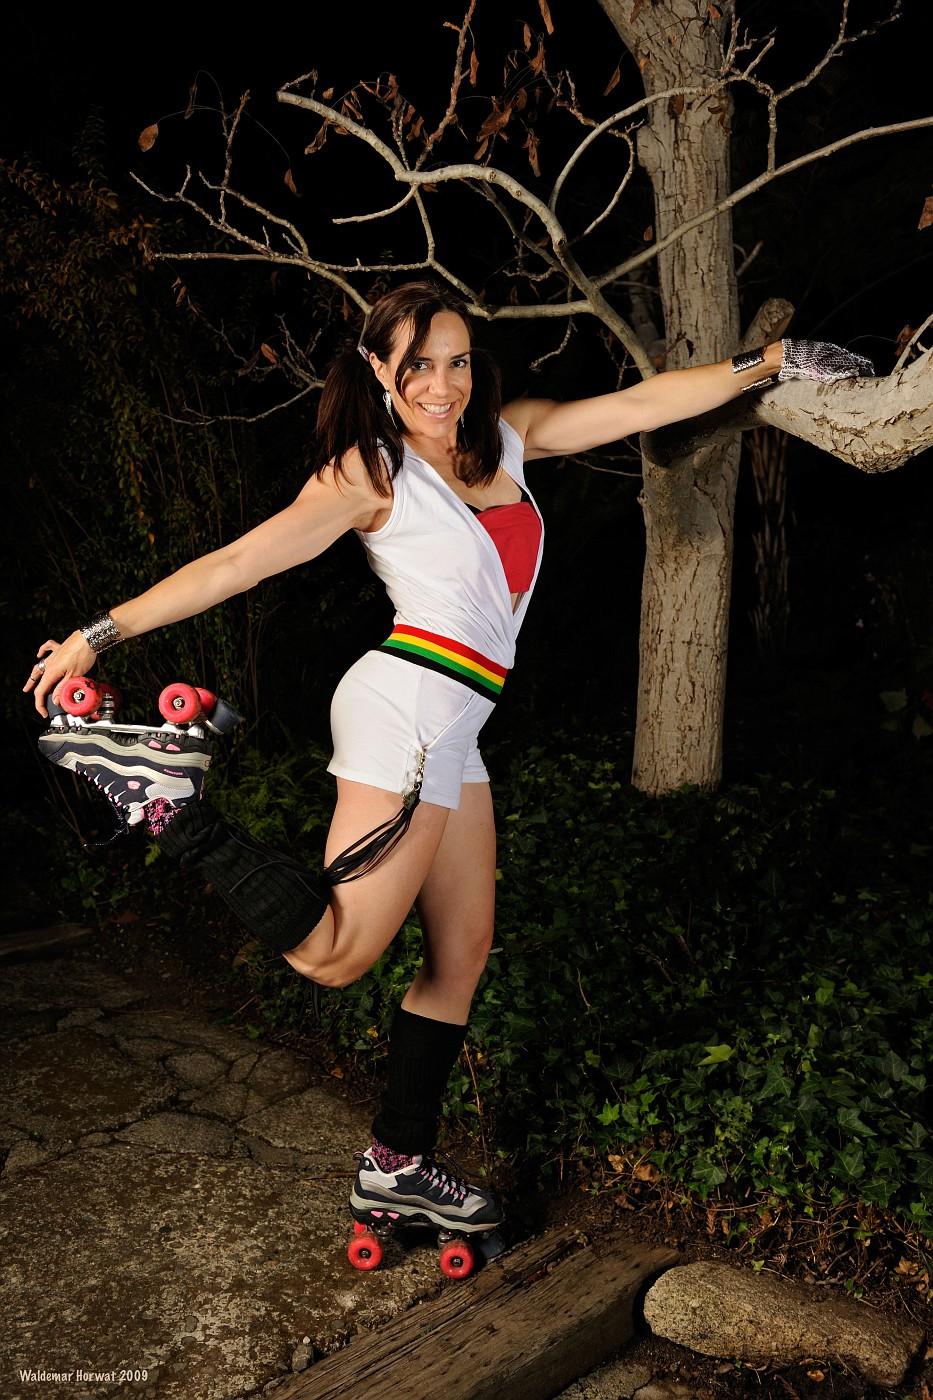 Beth on Roller Skates